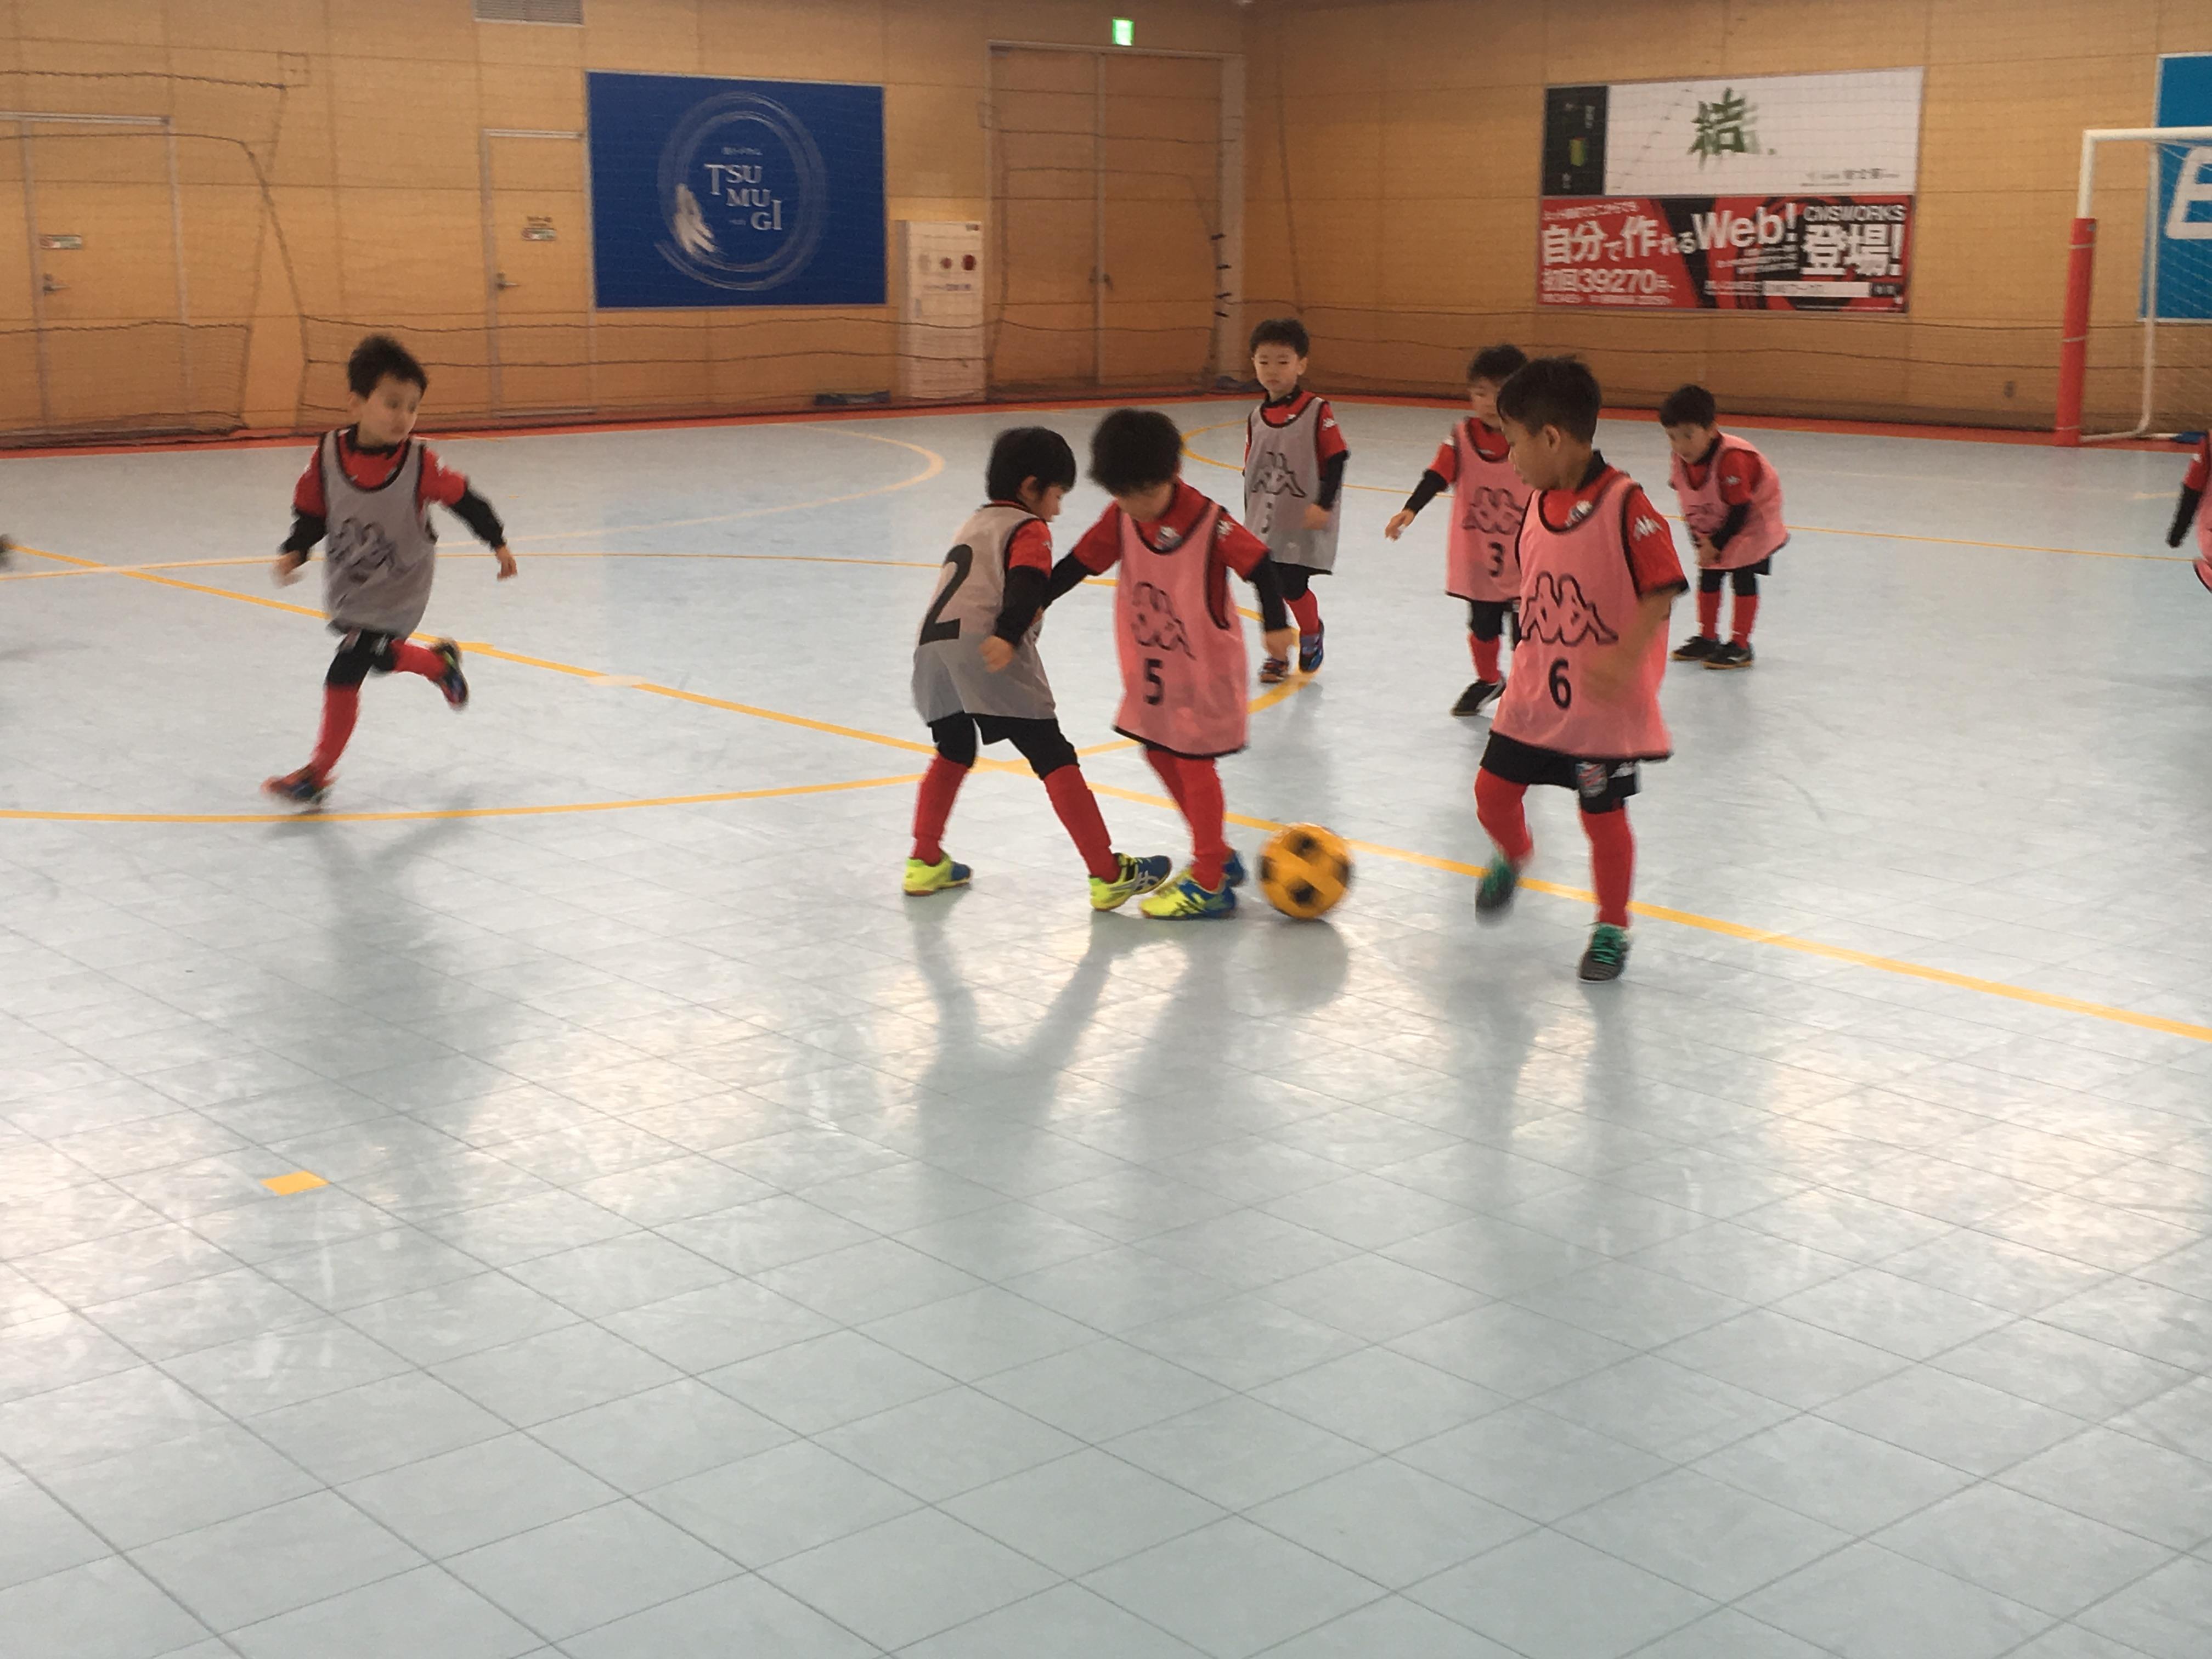 http://chsc.jp/report/up_images/AFE8FBD6-8067-41F6-A4E9-CD9AB1FE1C24.jpeg